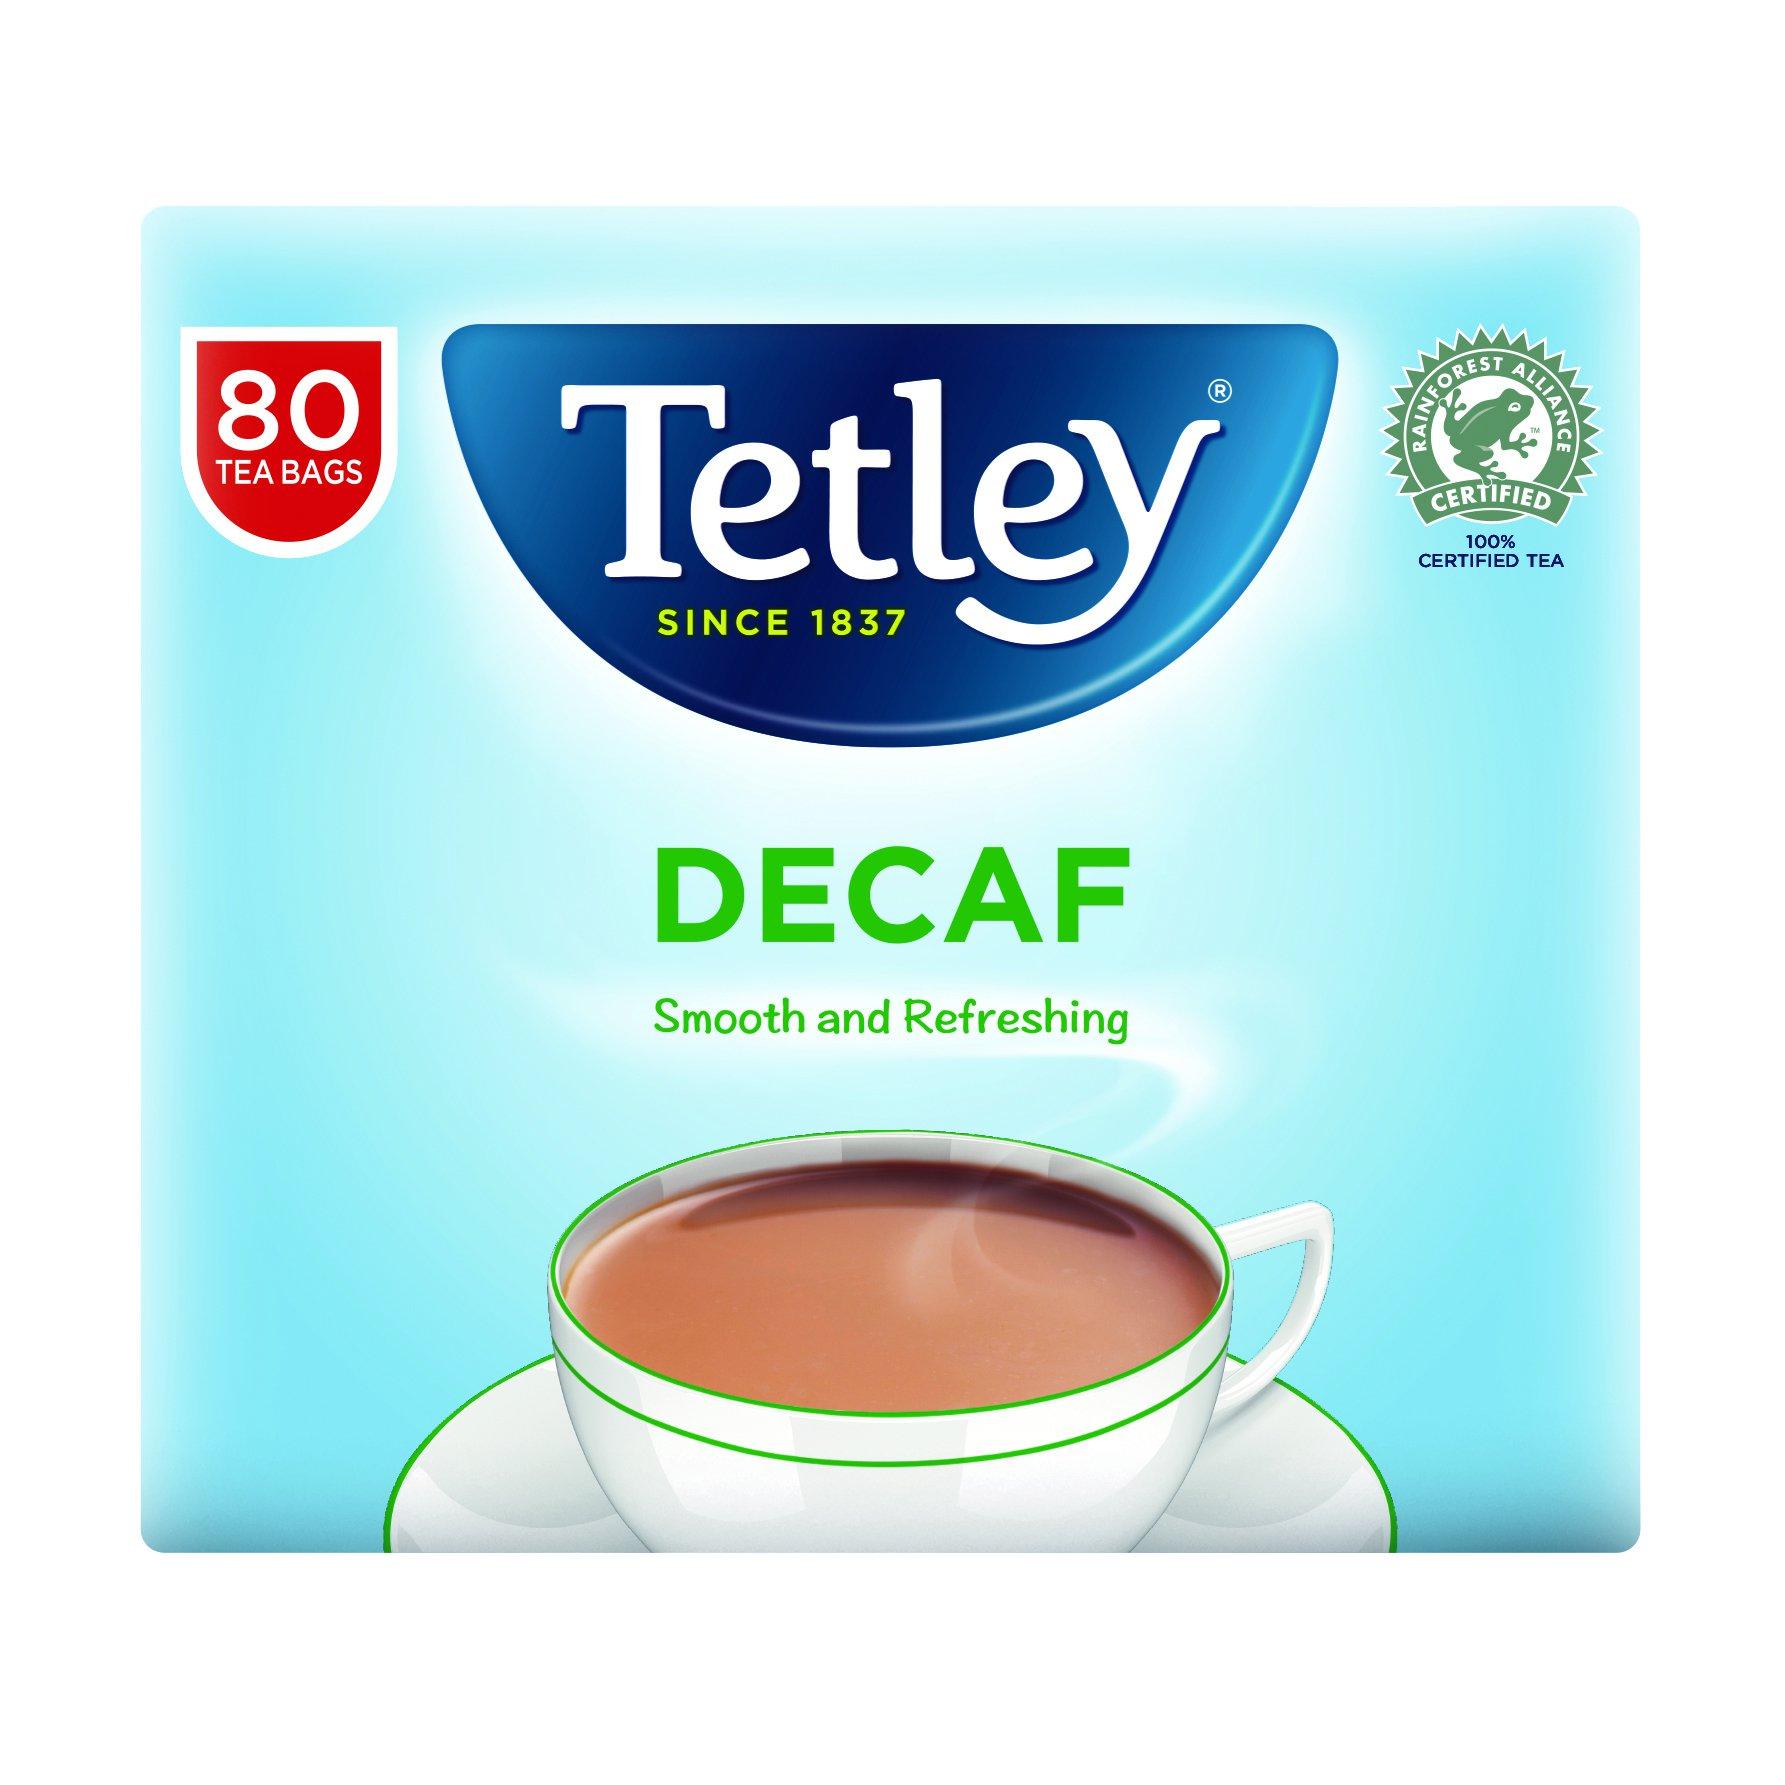 Tetley Decaffeinated Tea Bags (80)